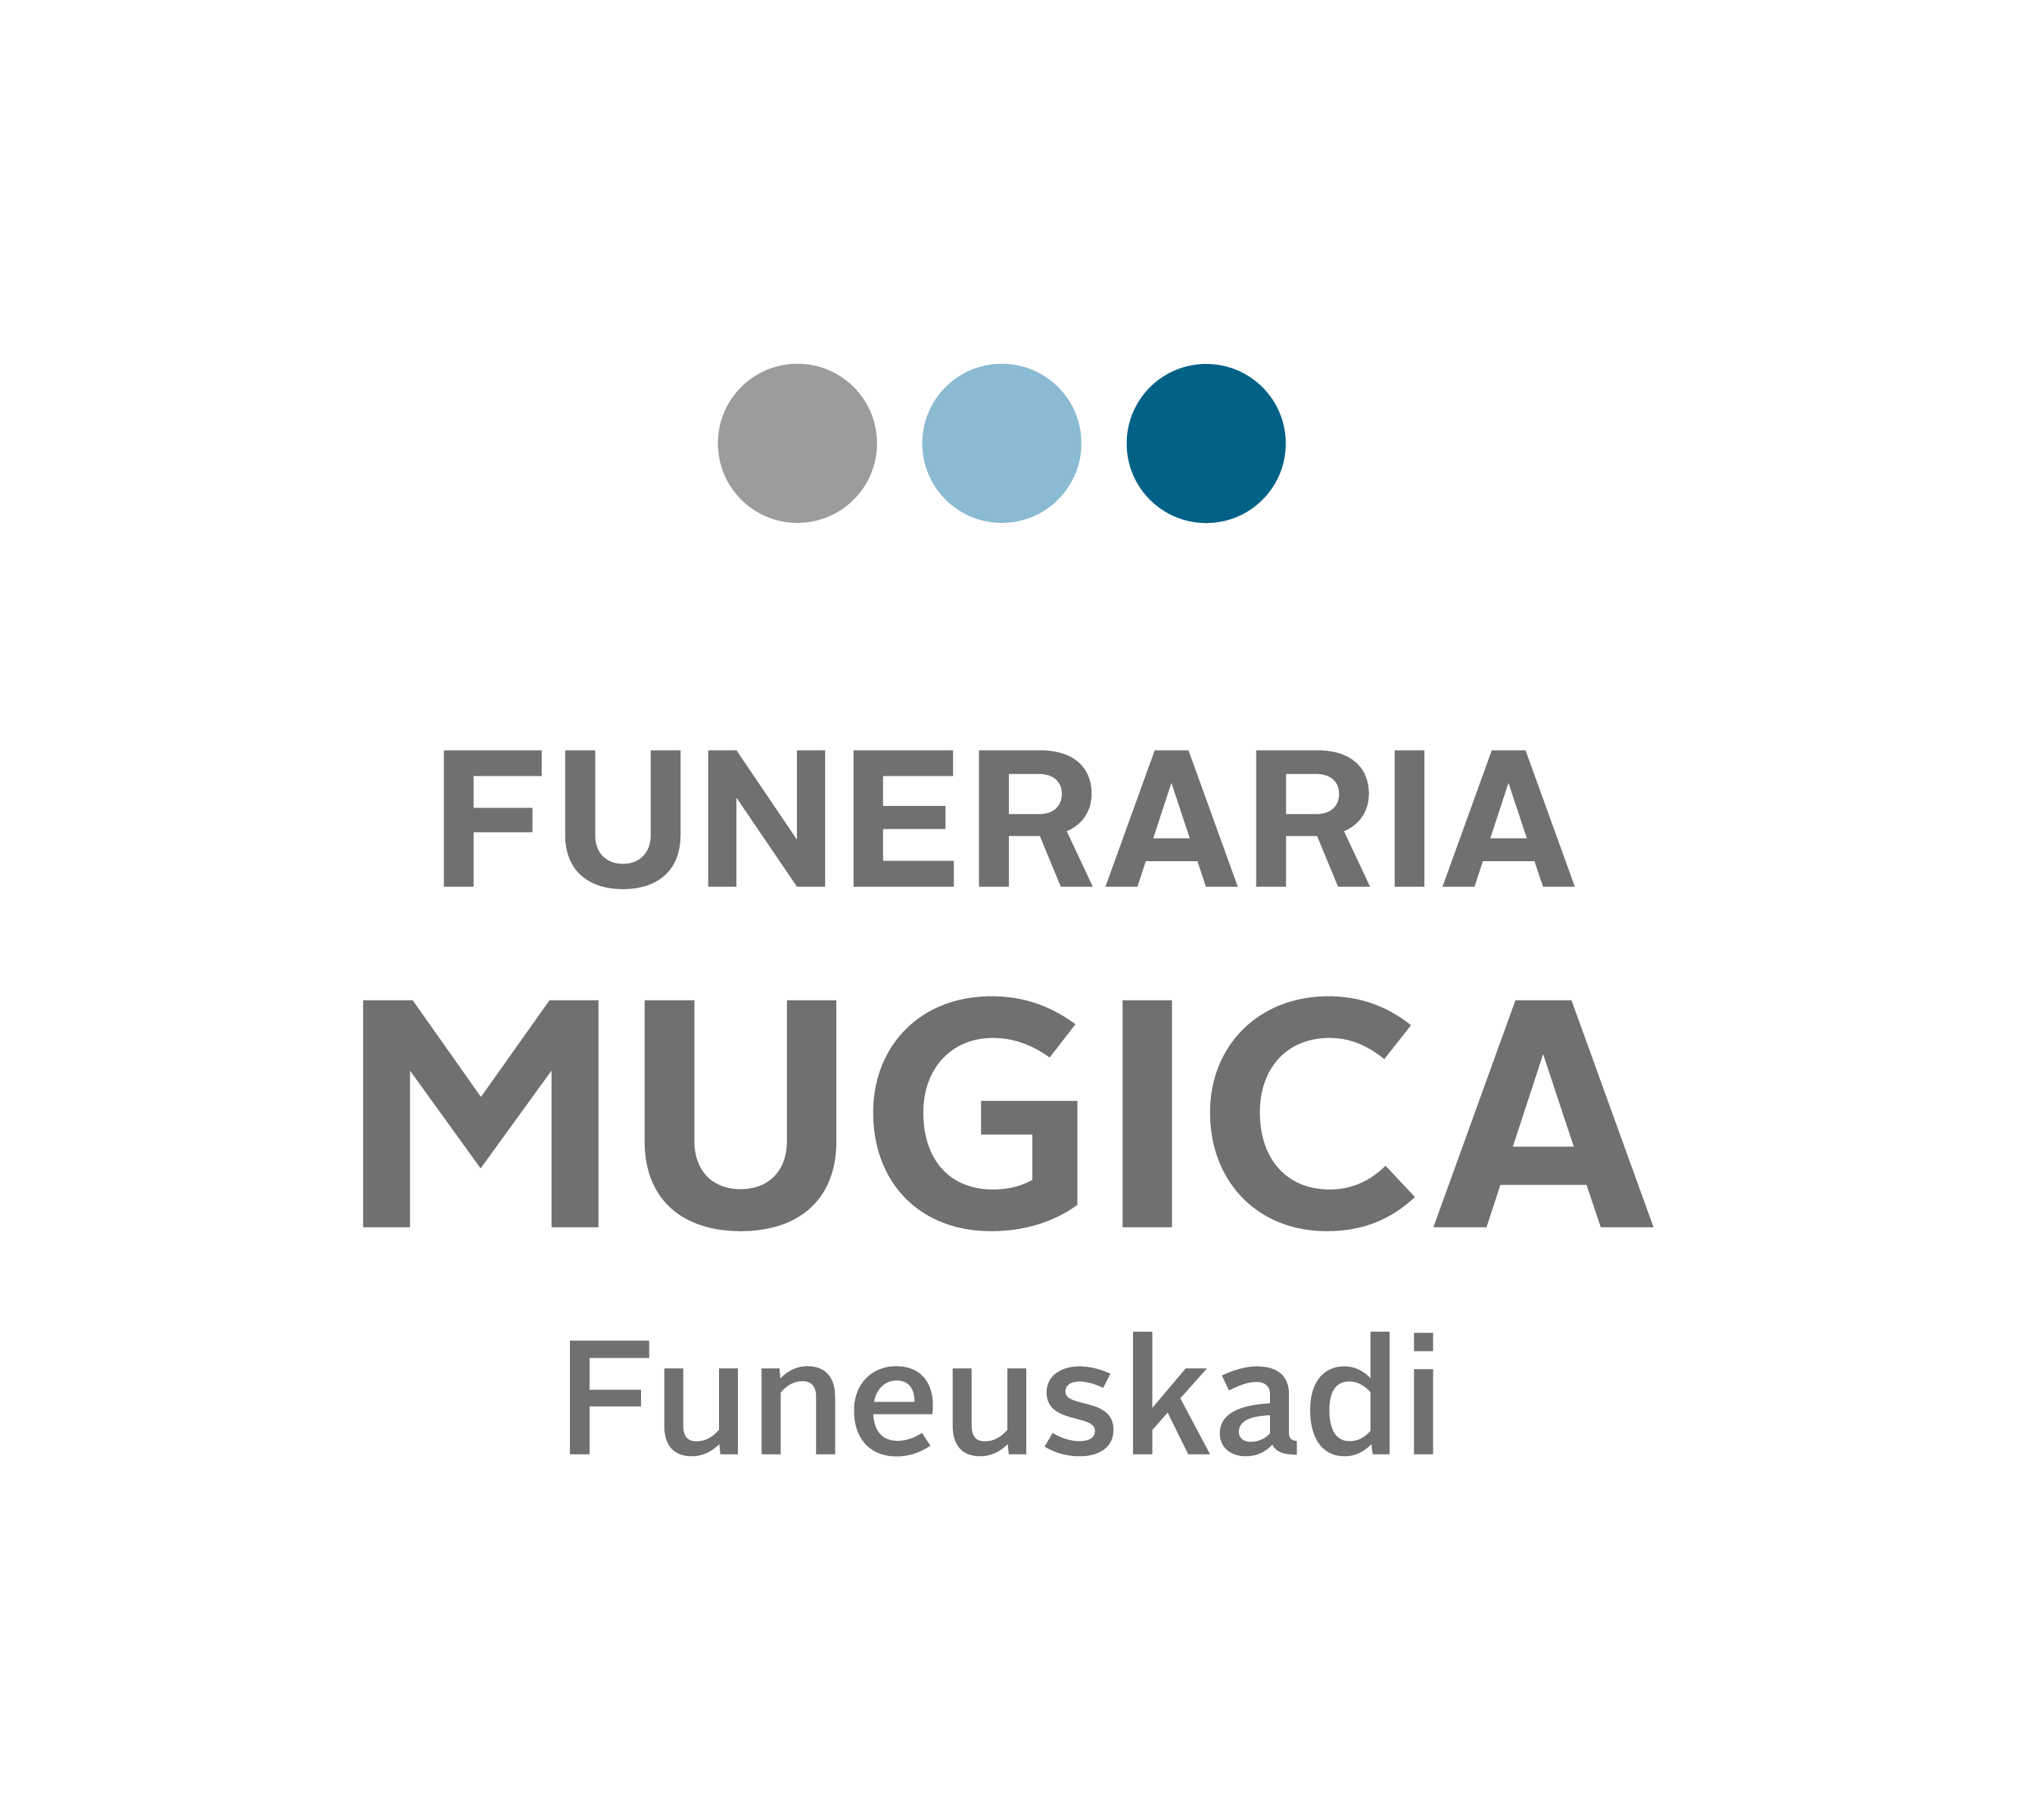 FUNERARIA ERMUA.  FUNEUSKADI